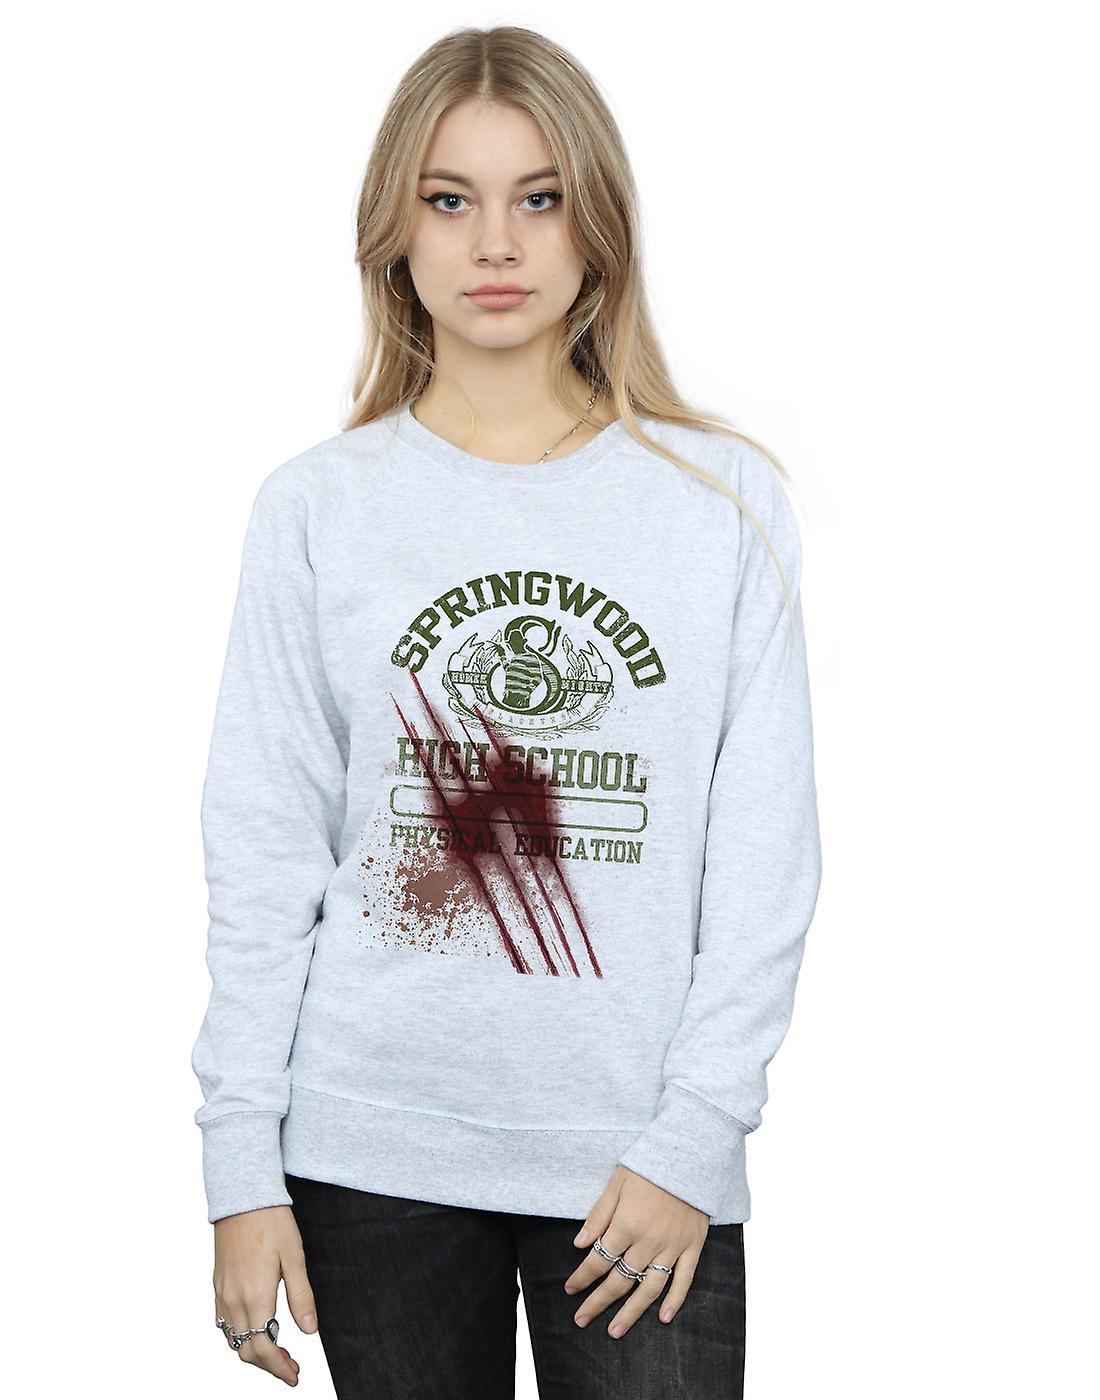 A Nightmare On Elm Street femmes&s Springwood Slasher Sweatshirt